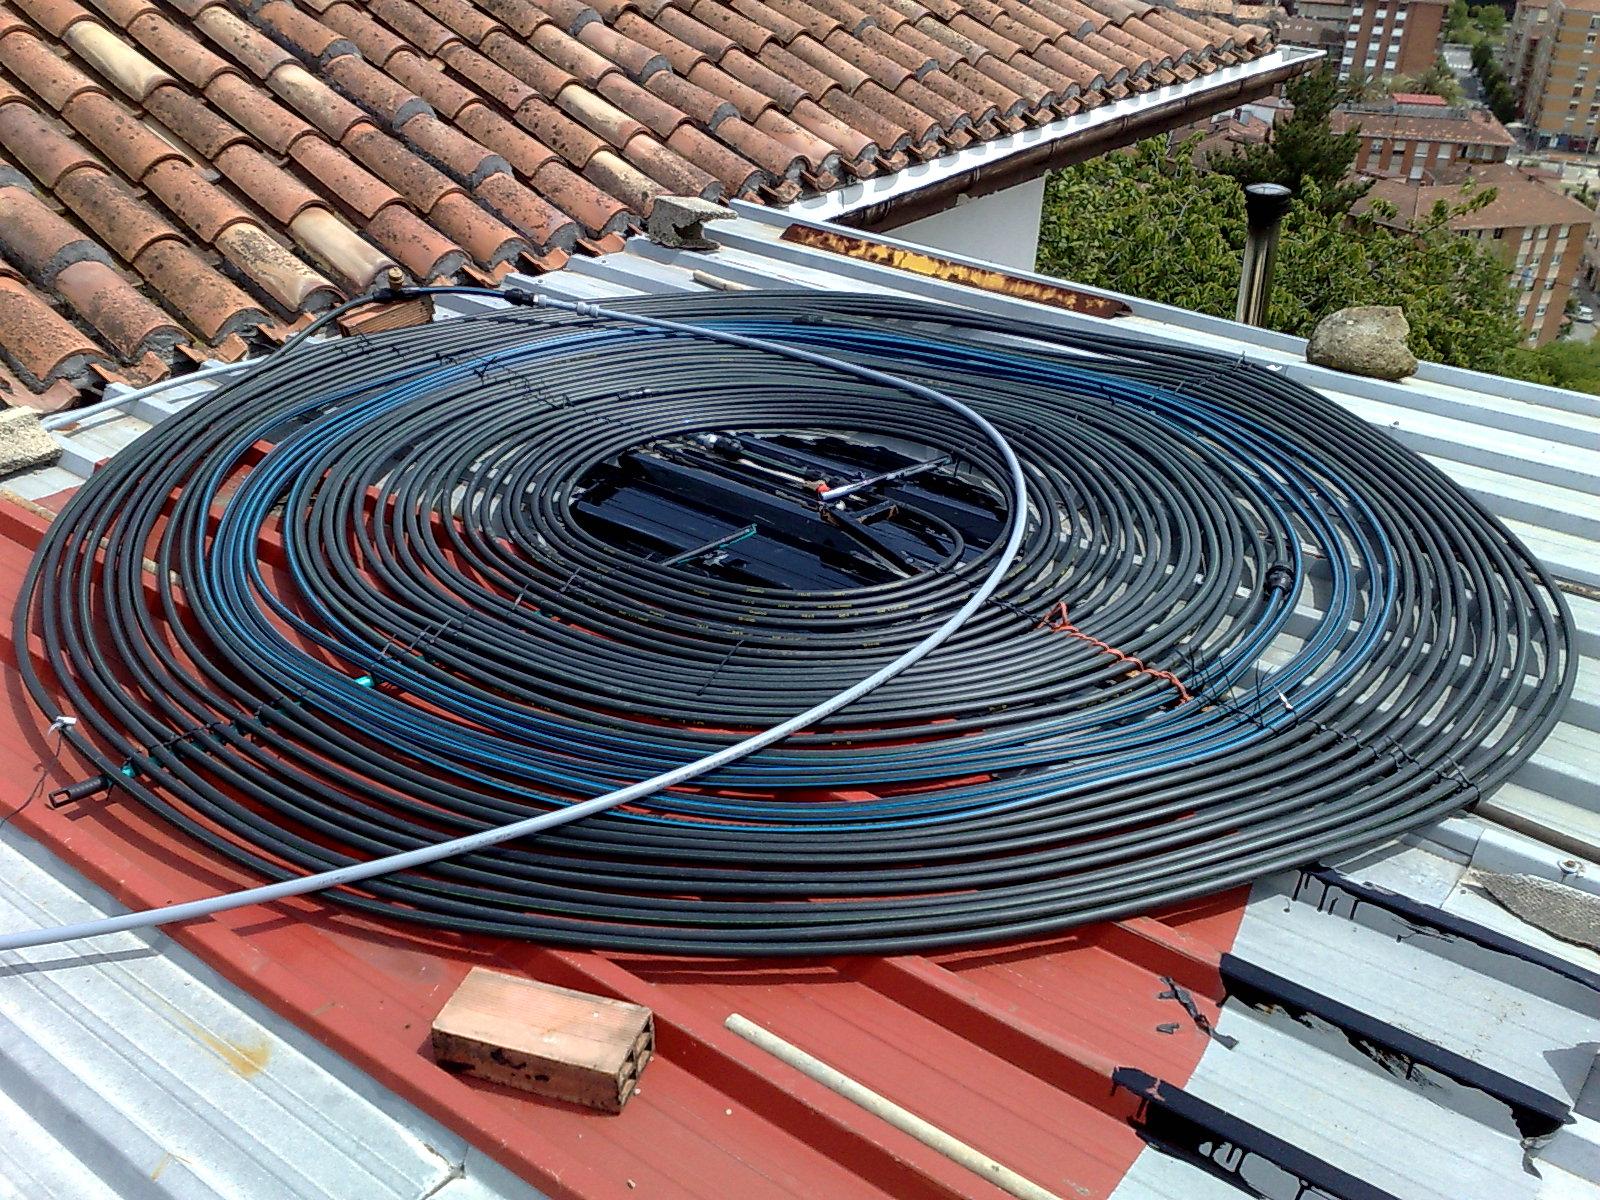 Dise o placas solares calentar piscina casa dise o for Montar placas solares en casa